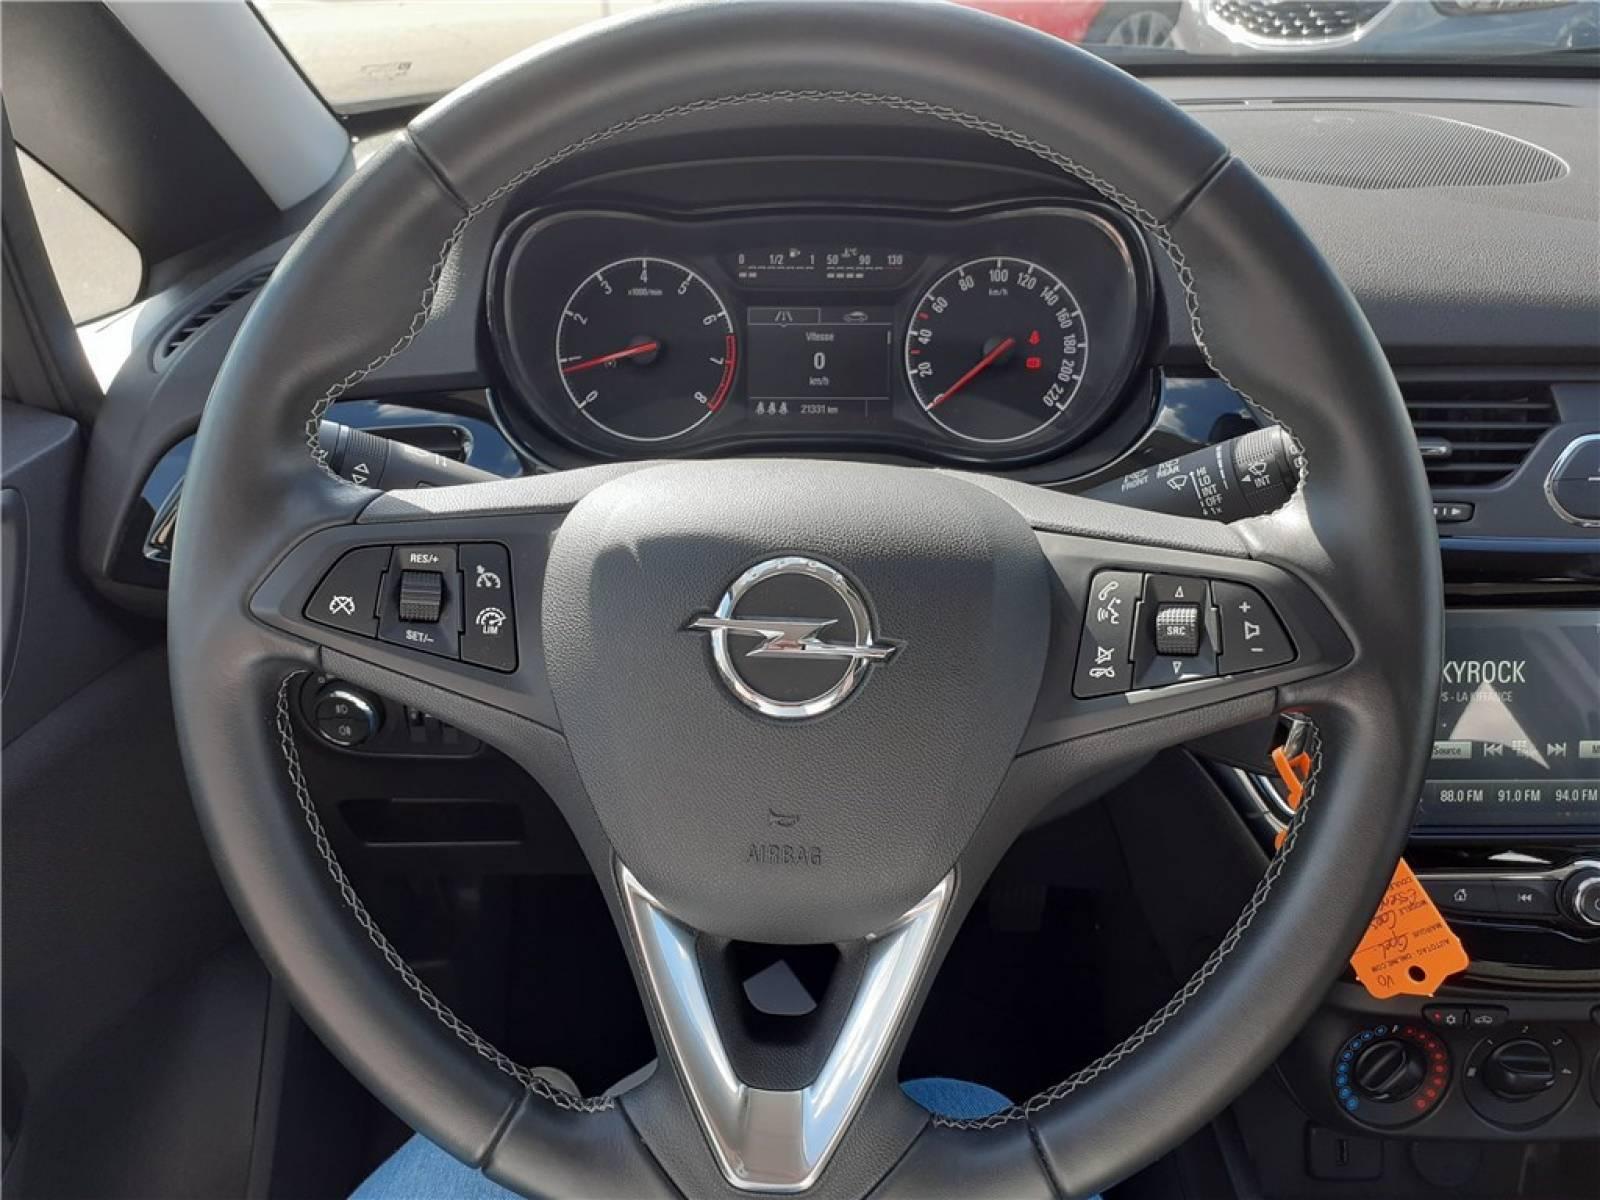 OPEL Corsa 1.4 Turbo 100 ch - véhicule d'occasion - Groupe Guillet - Opel Magicauto - Chalon-sur-Saône - 71380 - Saint-Marcel - 20